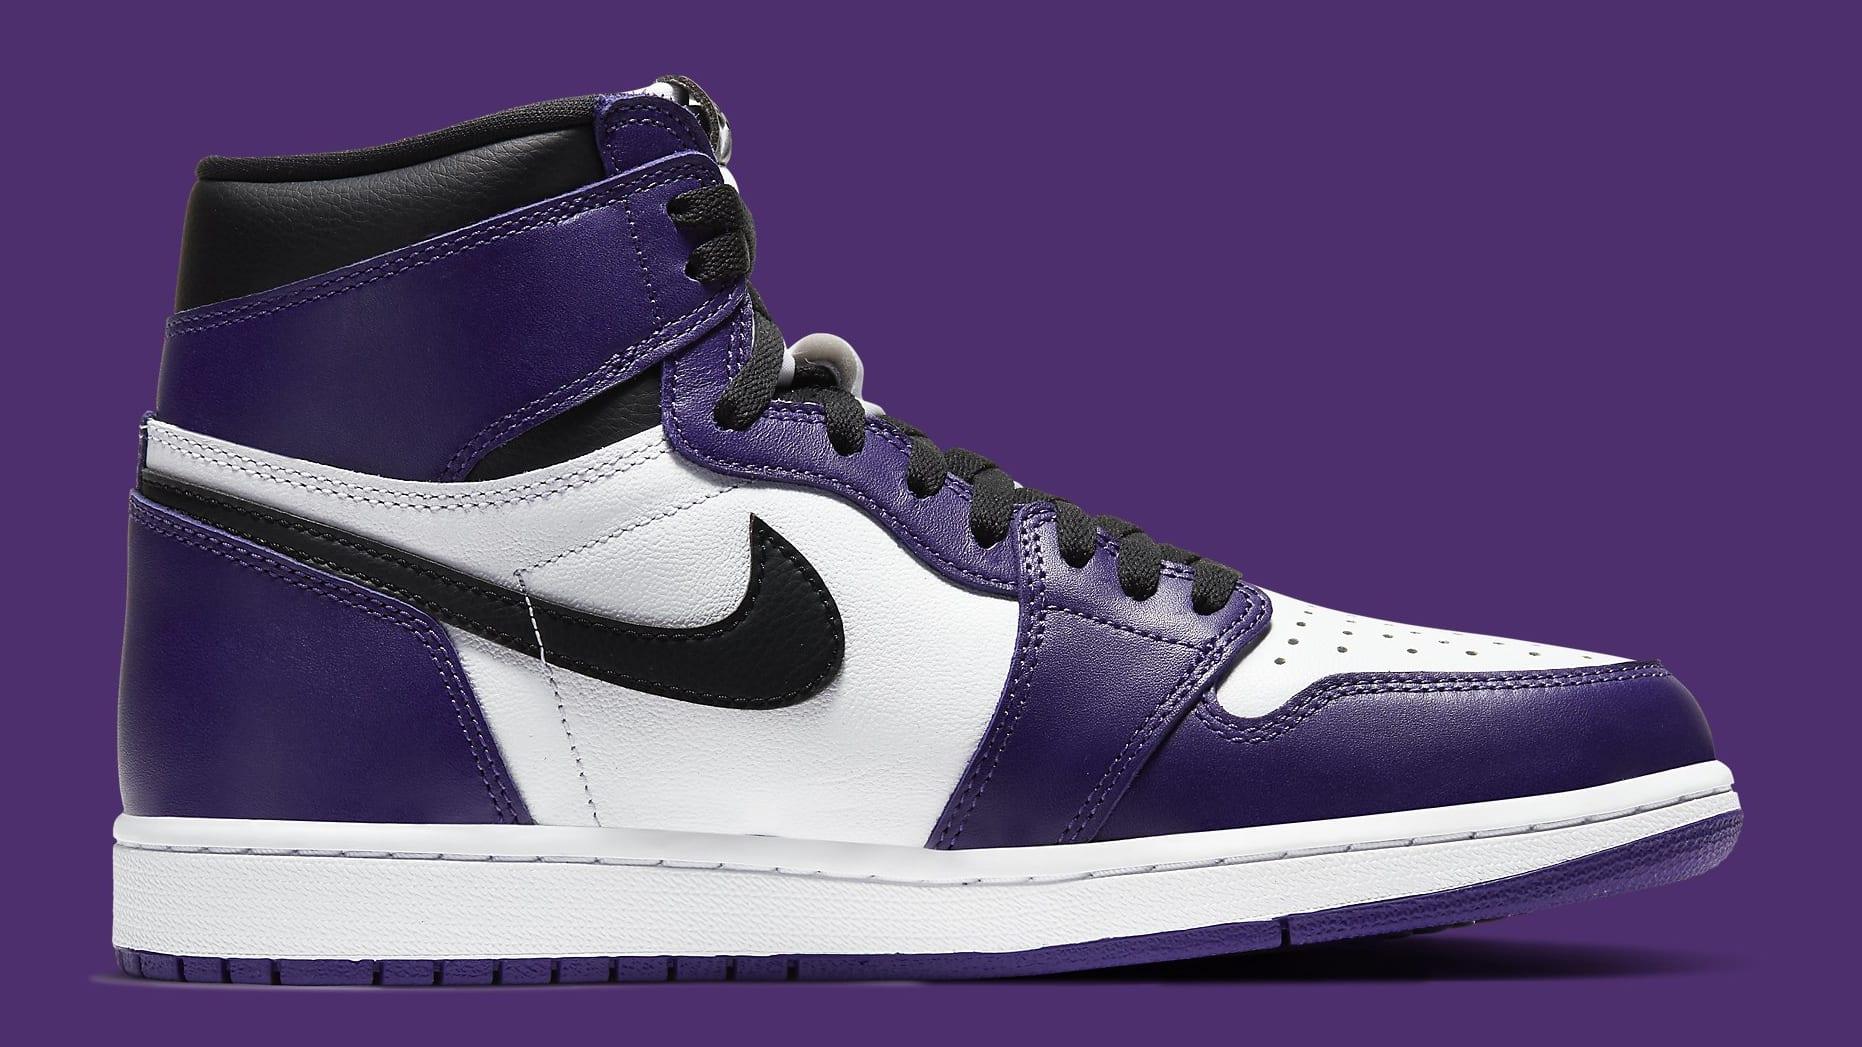 Air Jordan 1 Court Purple Release Date 555088-500 Medial